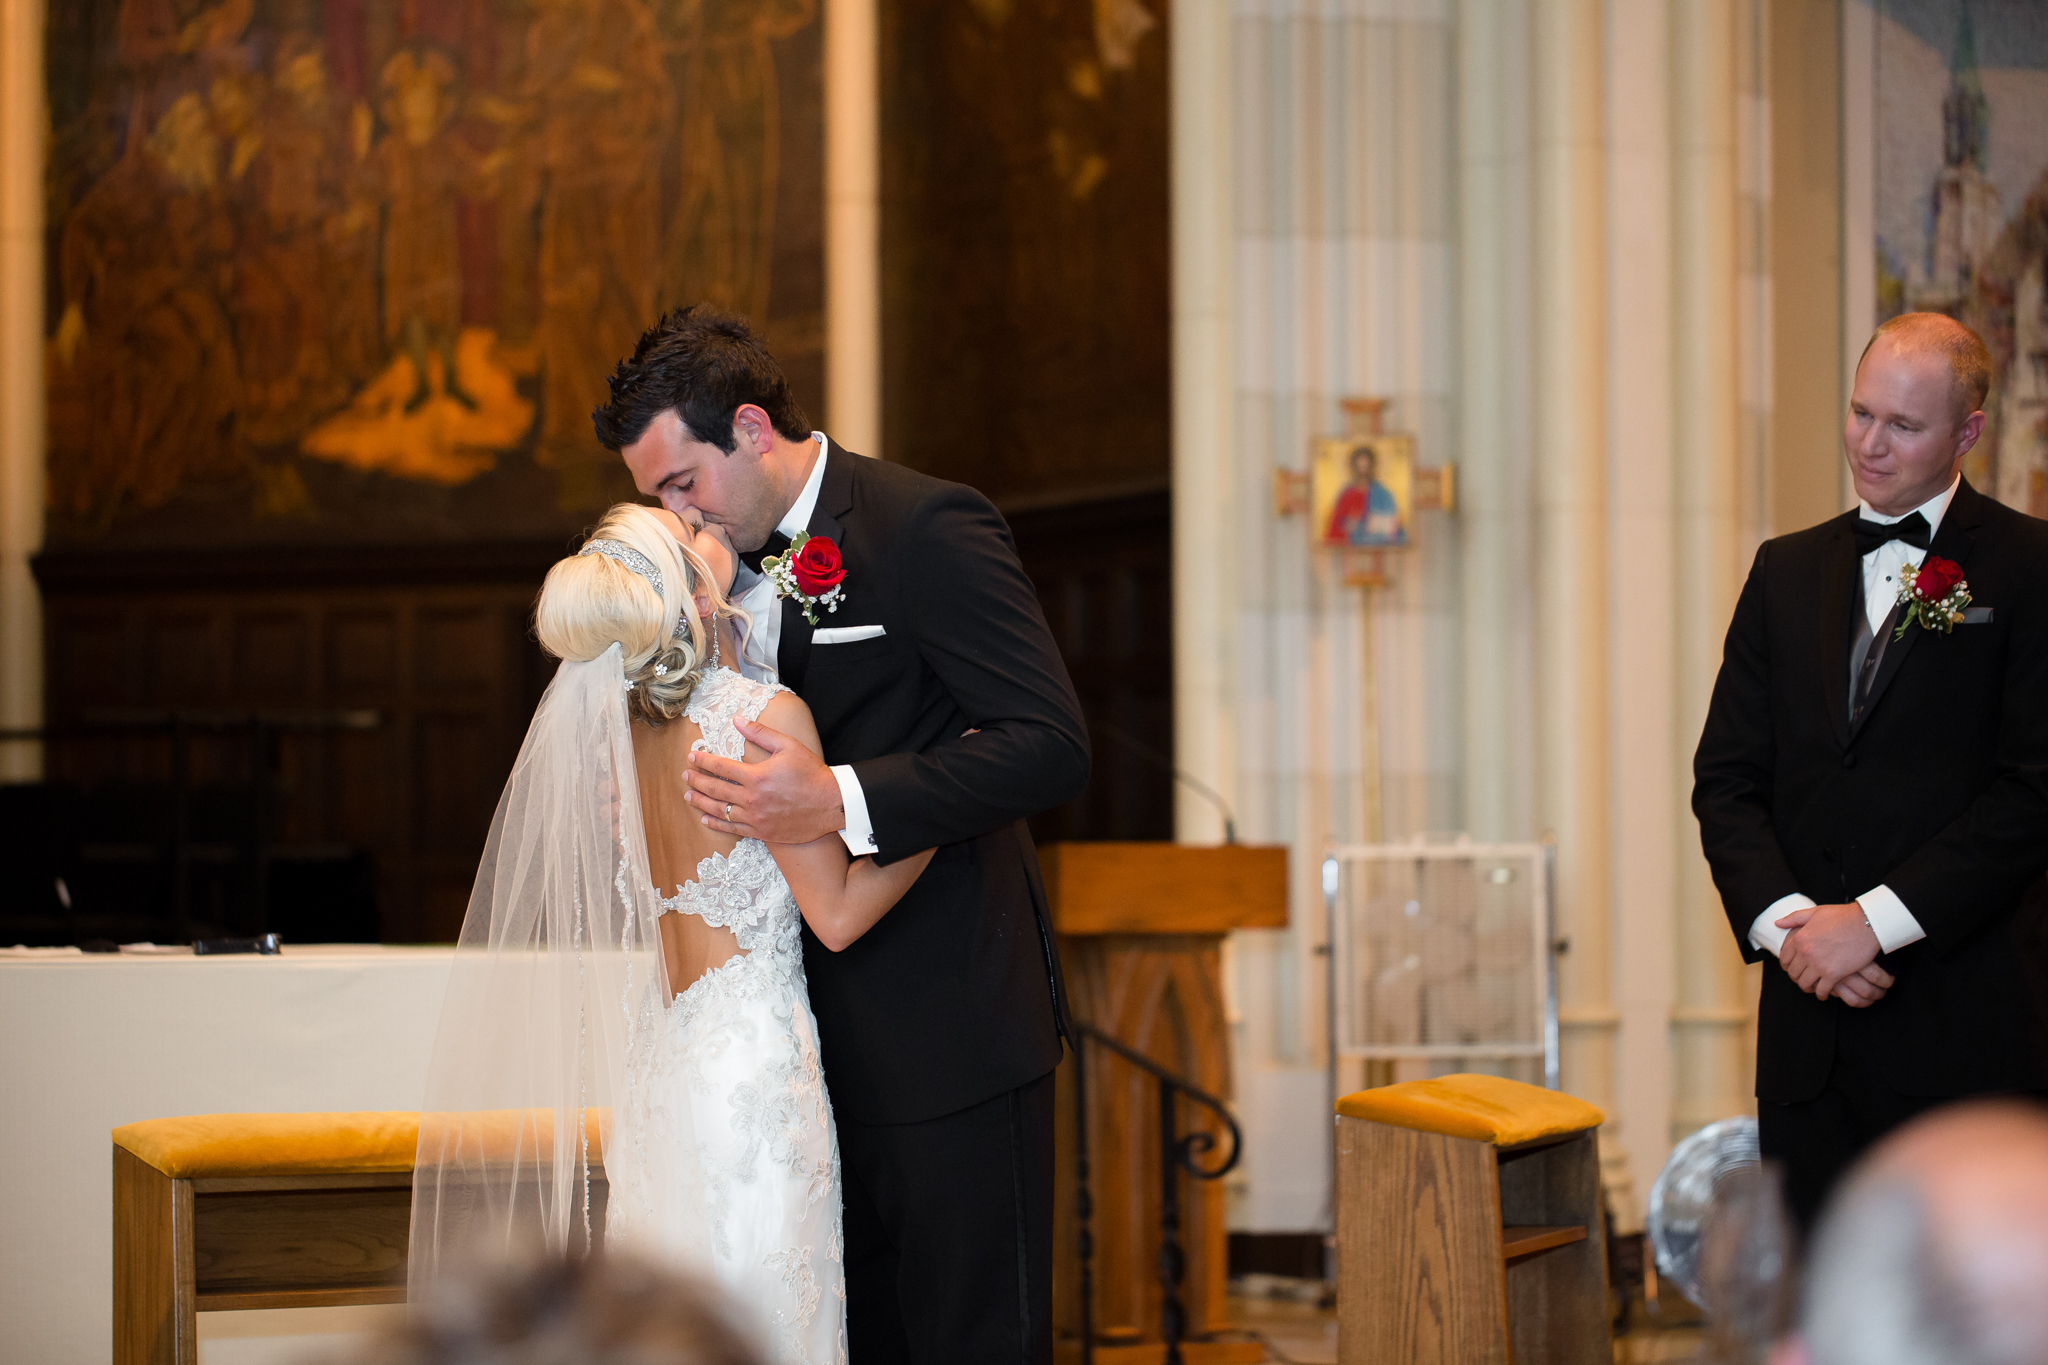 Statler-City-Buffalo-wedding-photographer- 0230.jpg